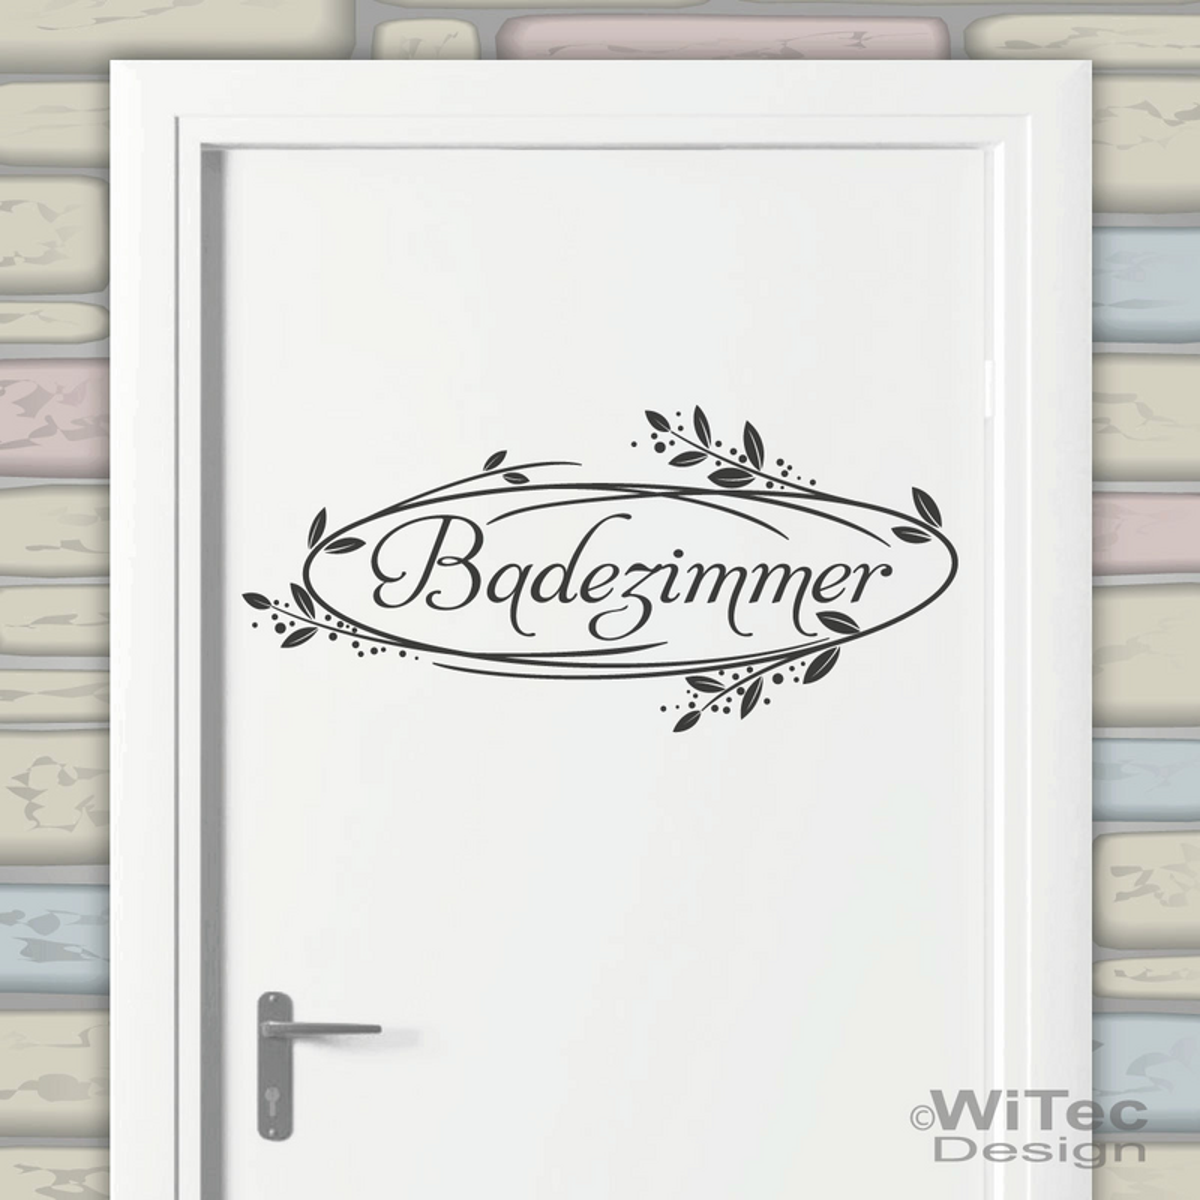 Türaufkleber Tür Aufkleber Badezimmer Ranke Wandtattoo